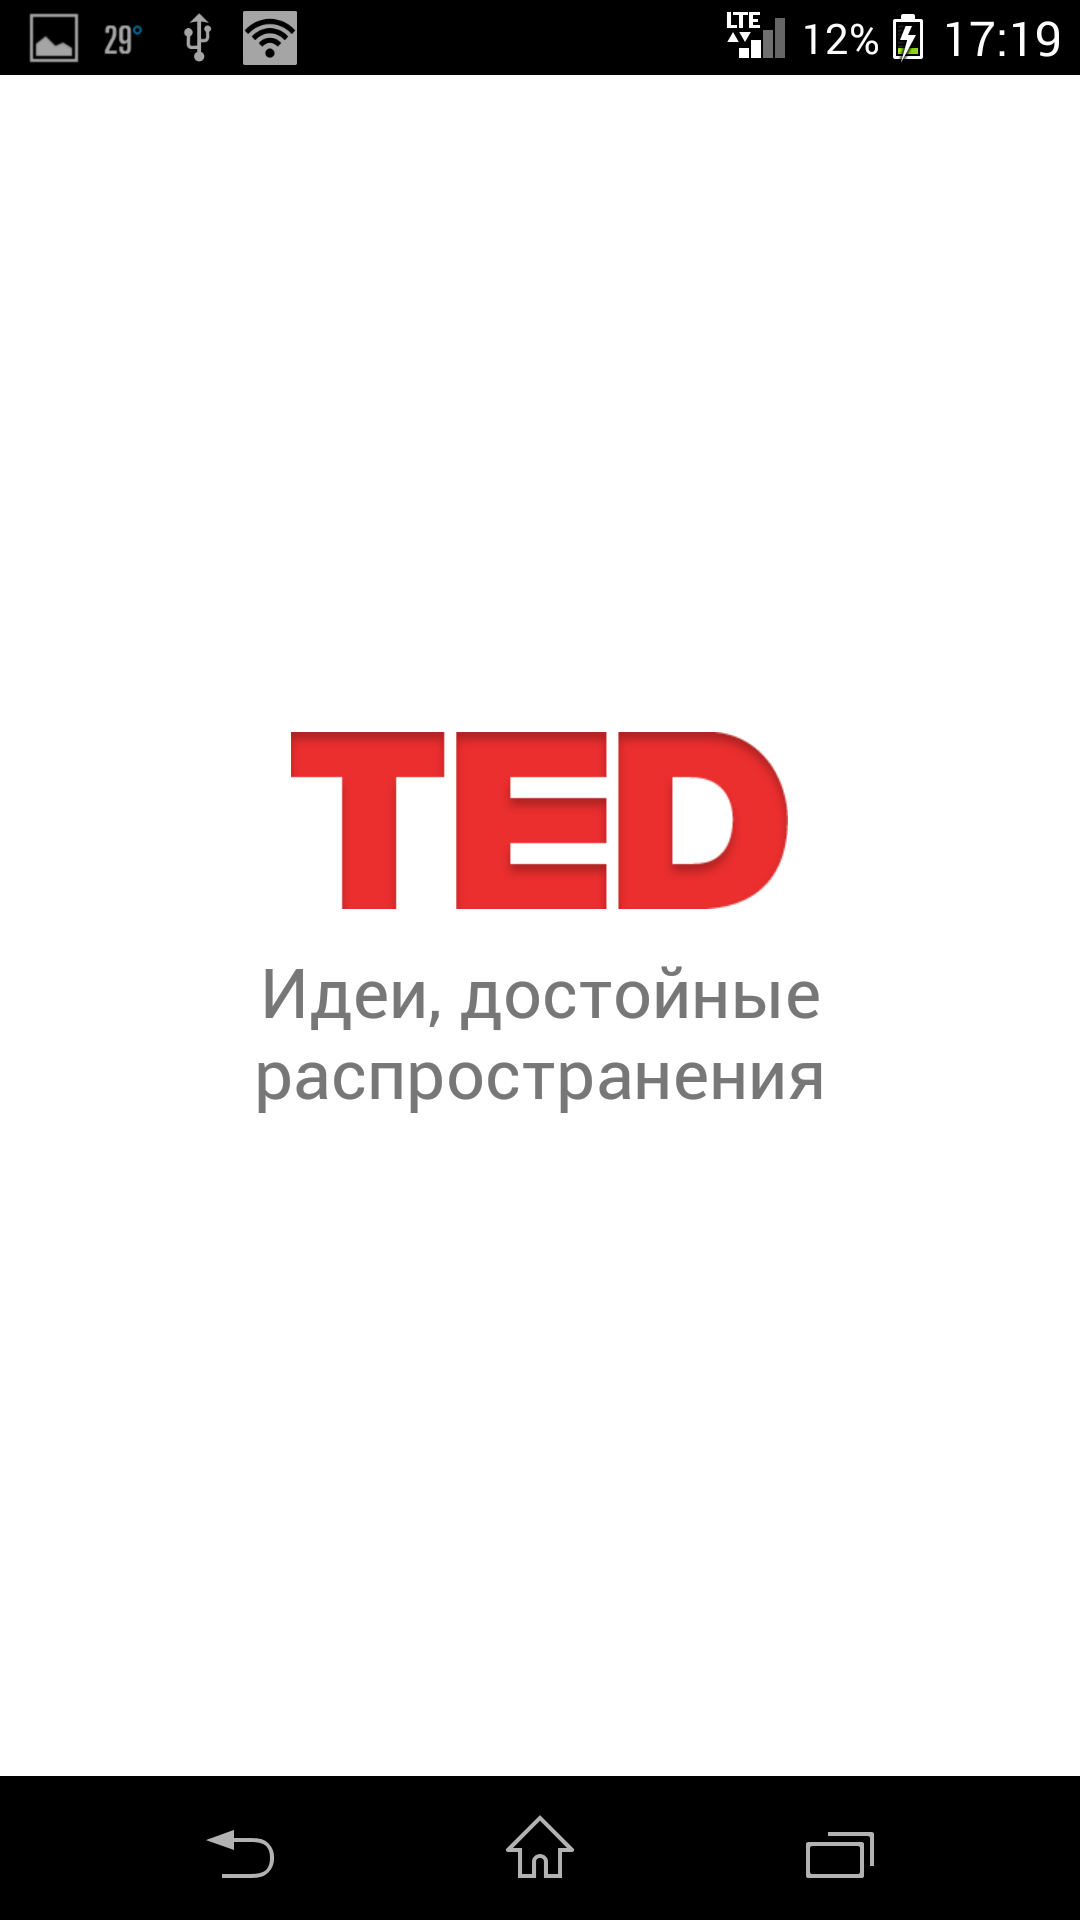 Логотип - TED для Android